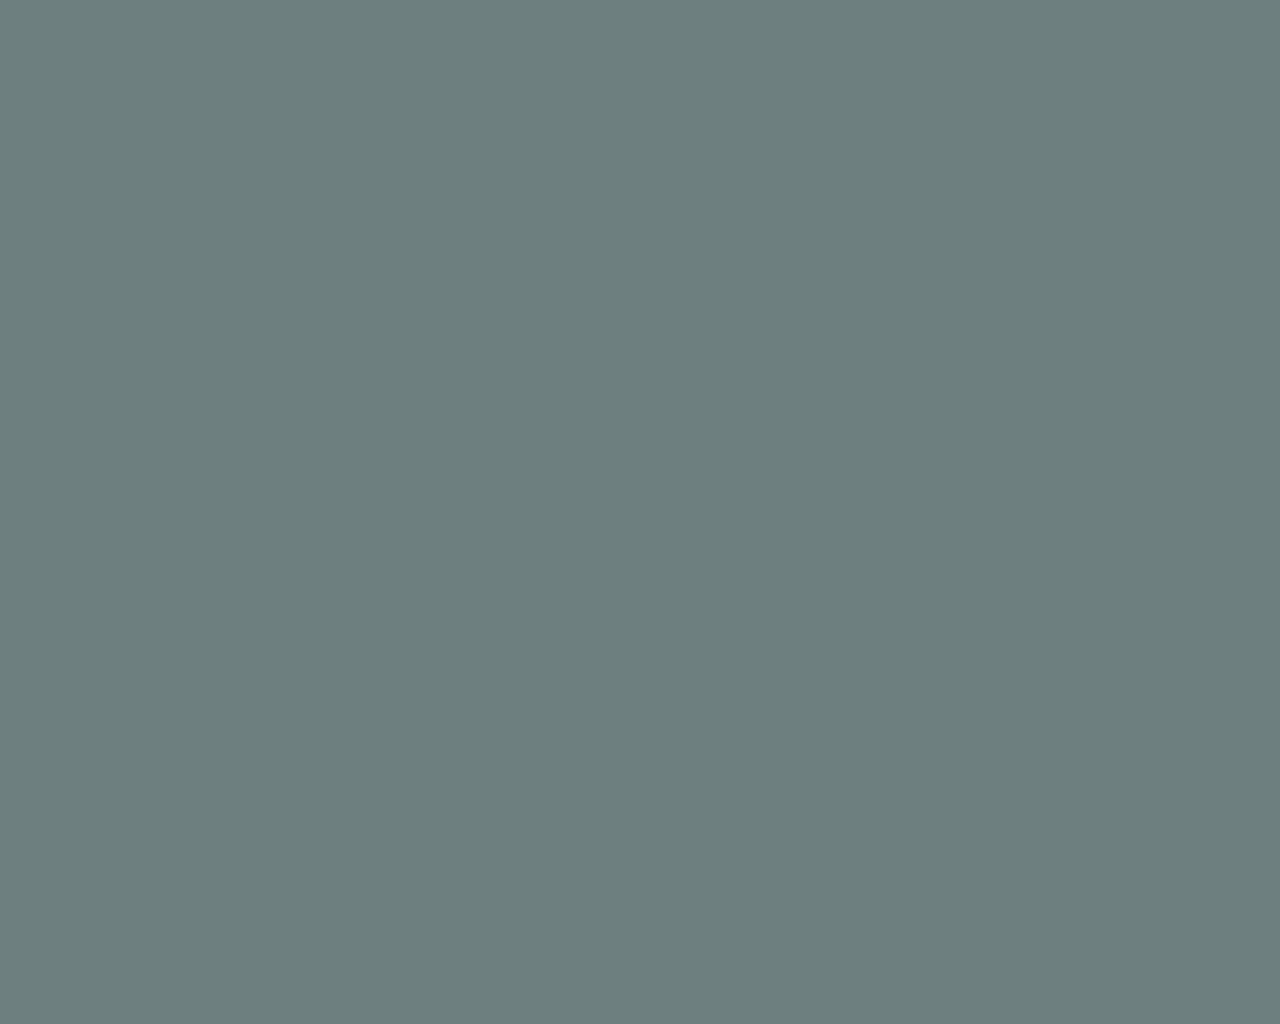 1280x1024 AuroMetalSaurus Solid Color Background